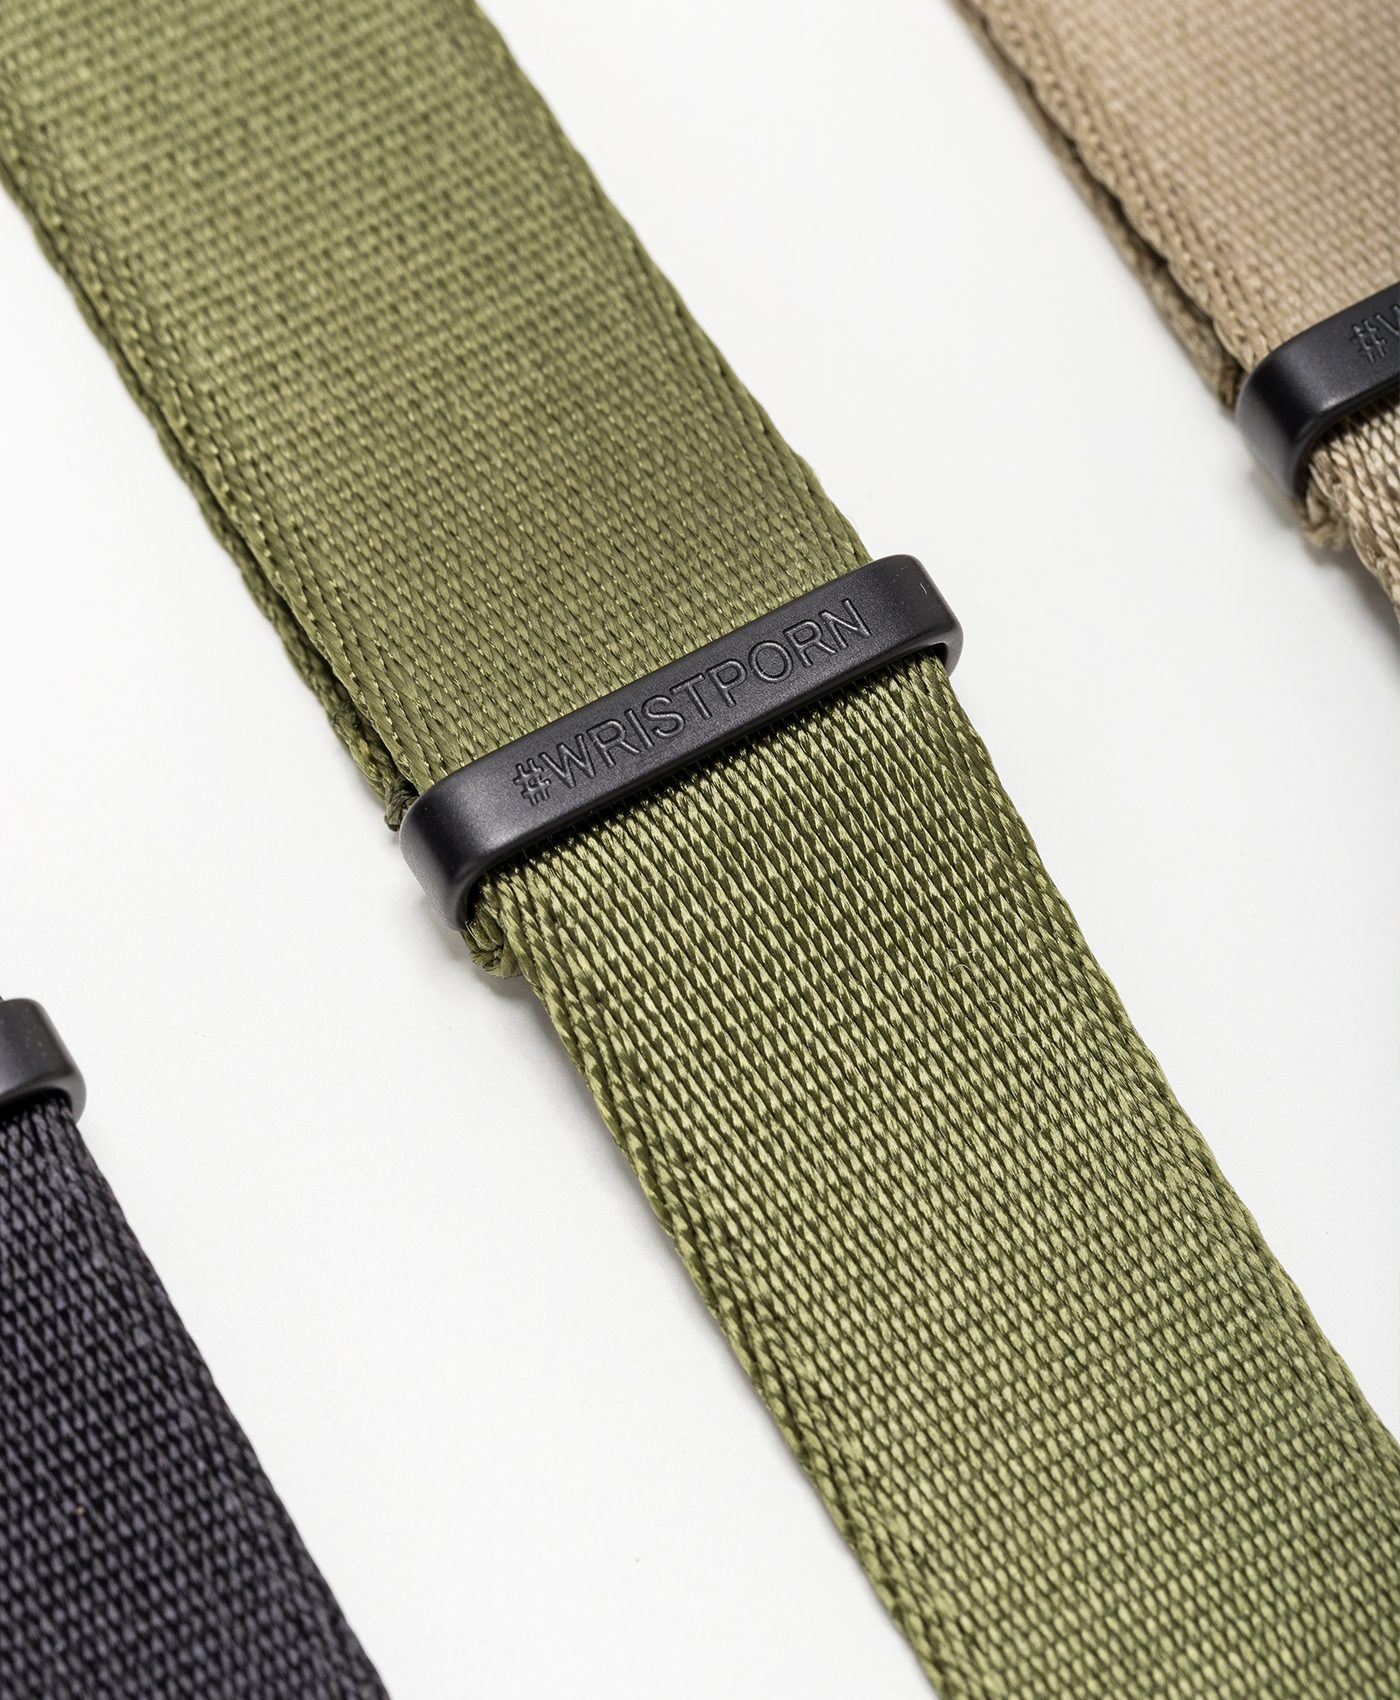 Watchbandit WB original Wristporn Nato straps bundle close up